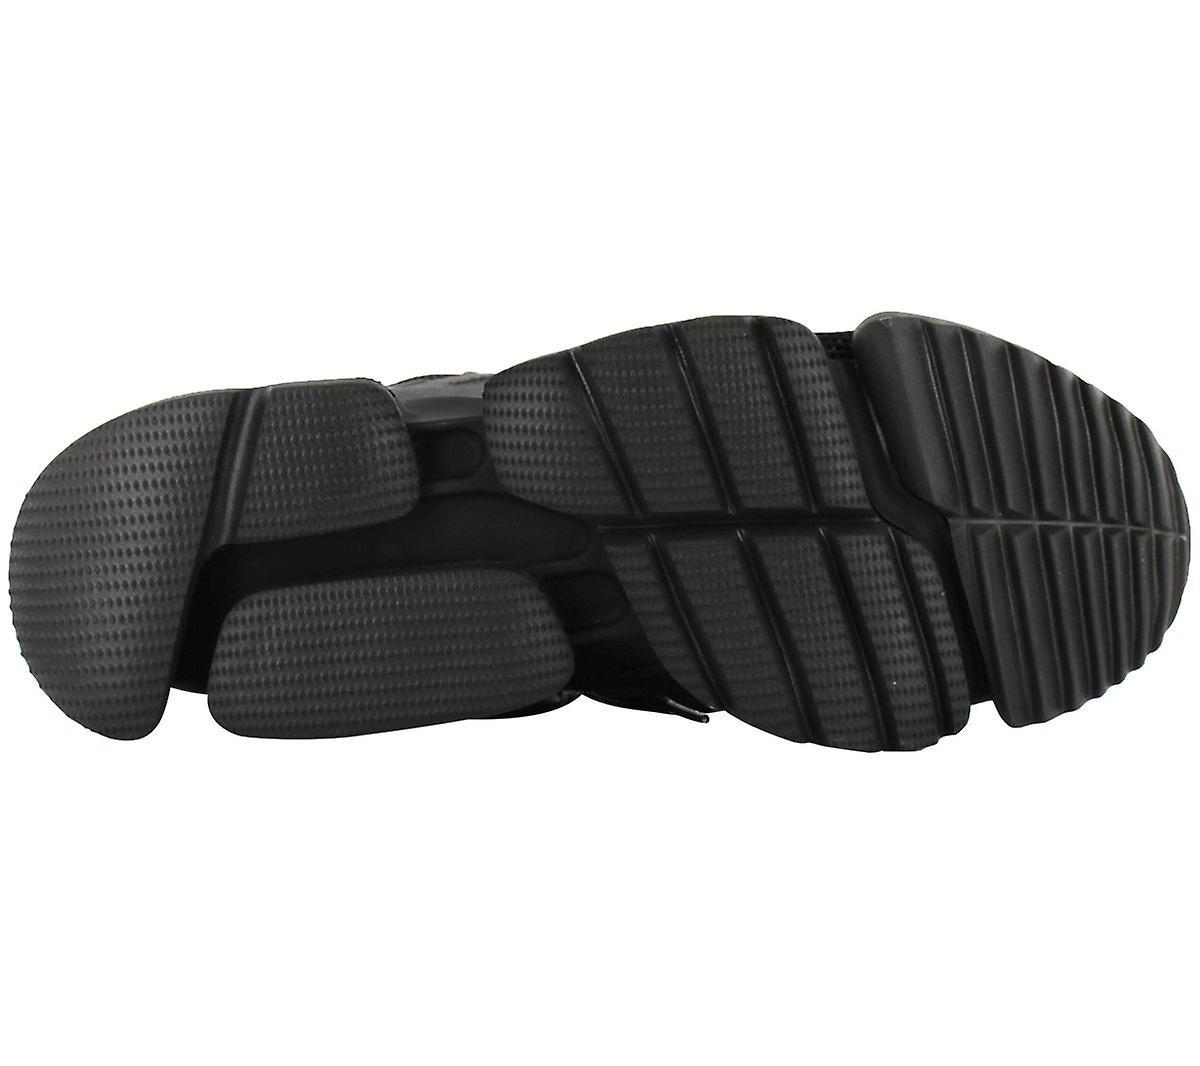 Reebok Classic Run R 96 - Herenschoenen Zwart CN4605 Sneakers Sportschoenen - Gratis verzending 88X3mU